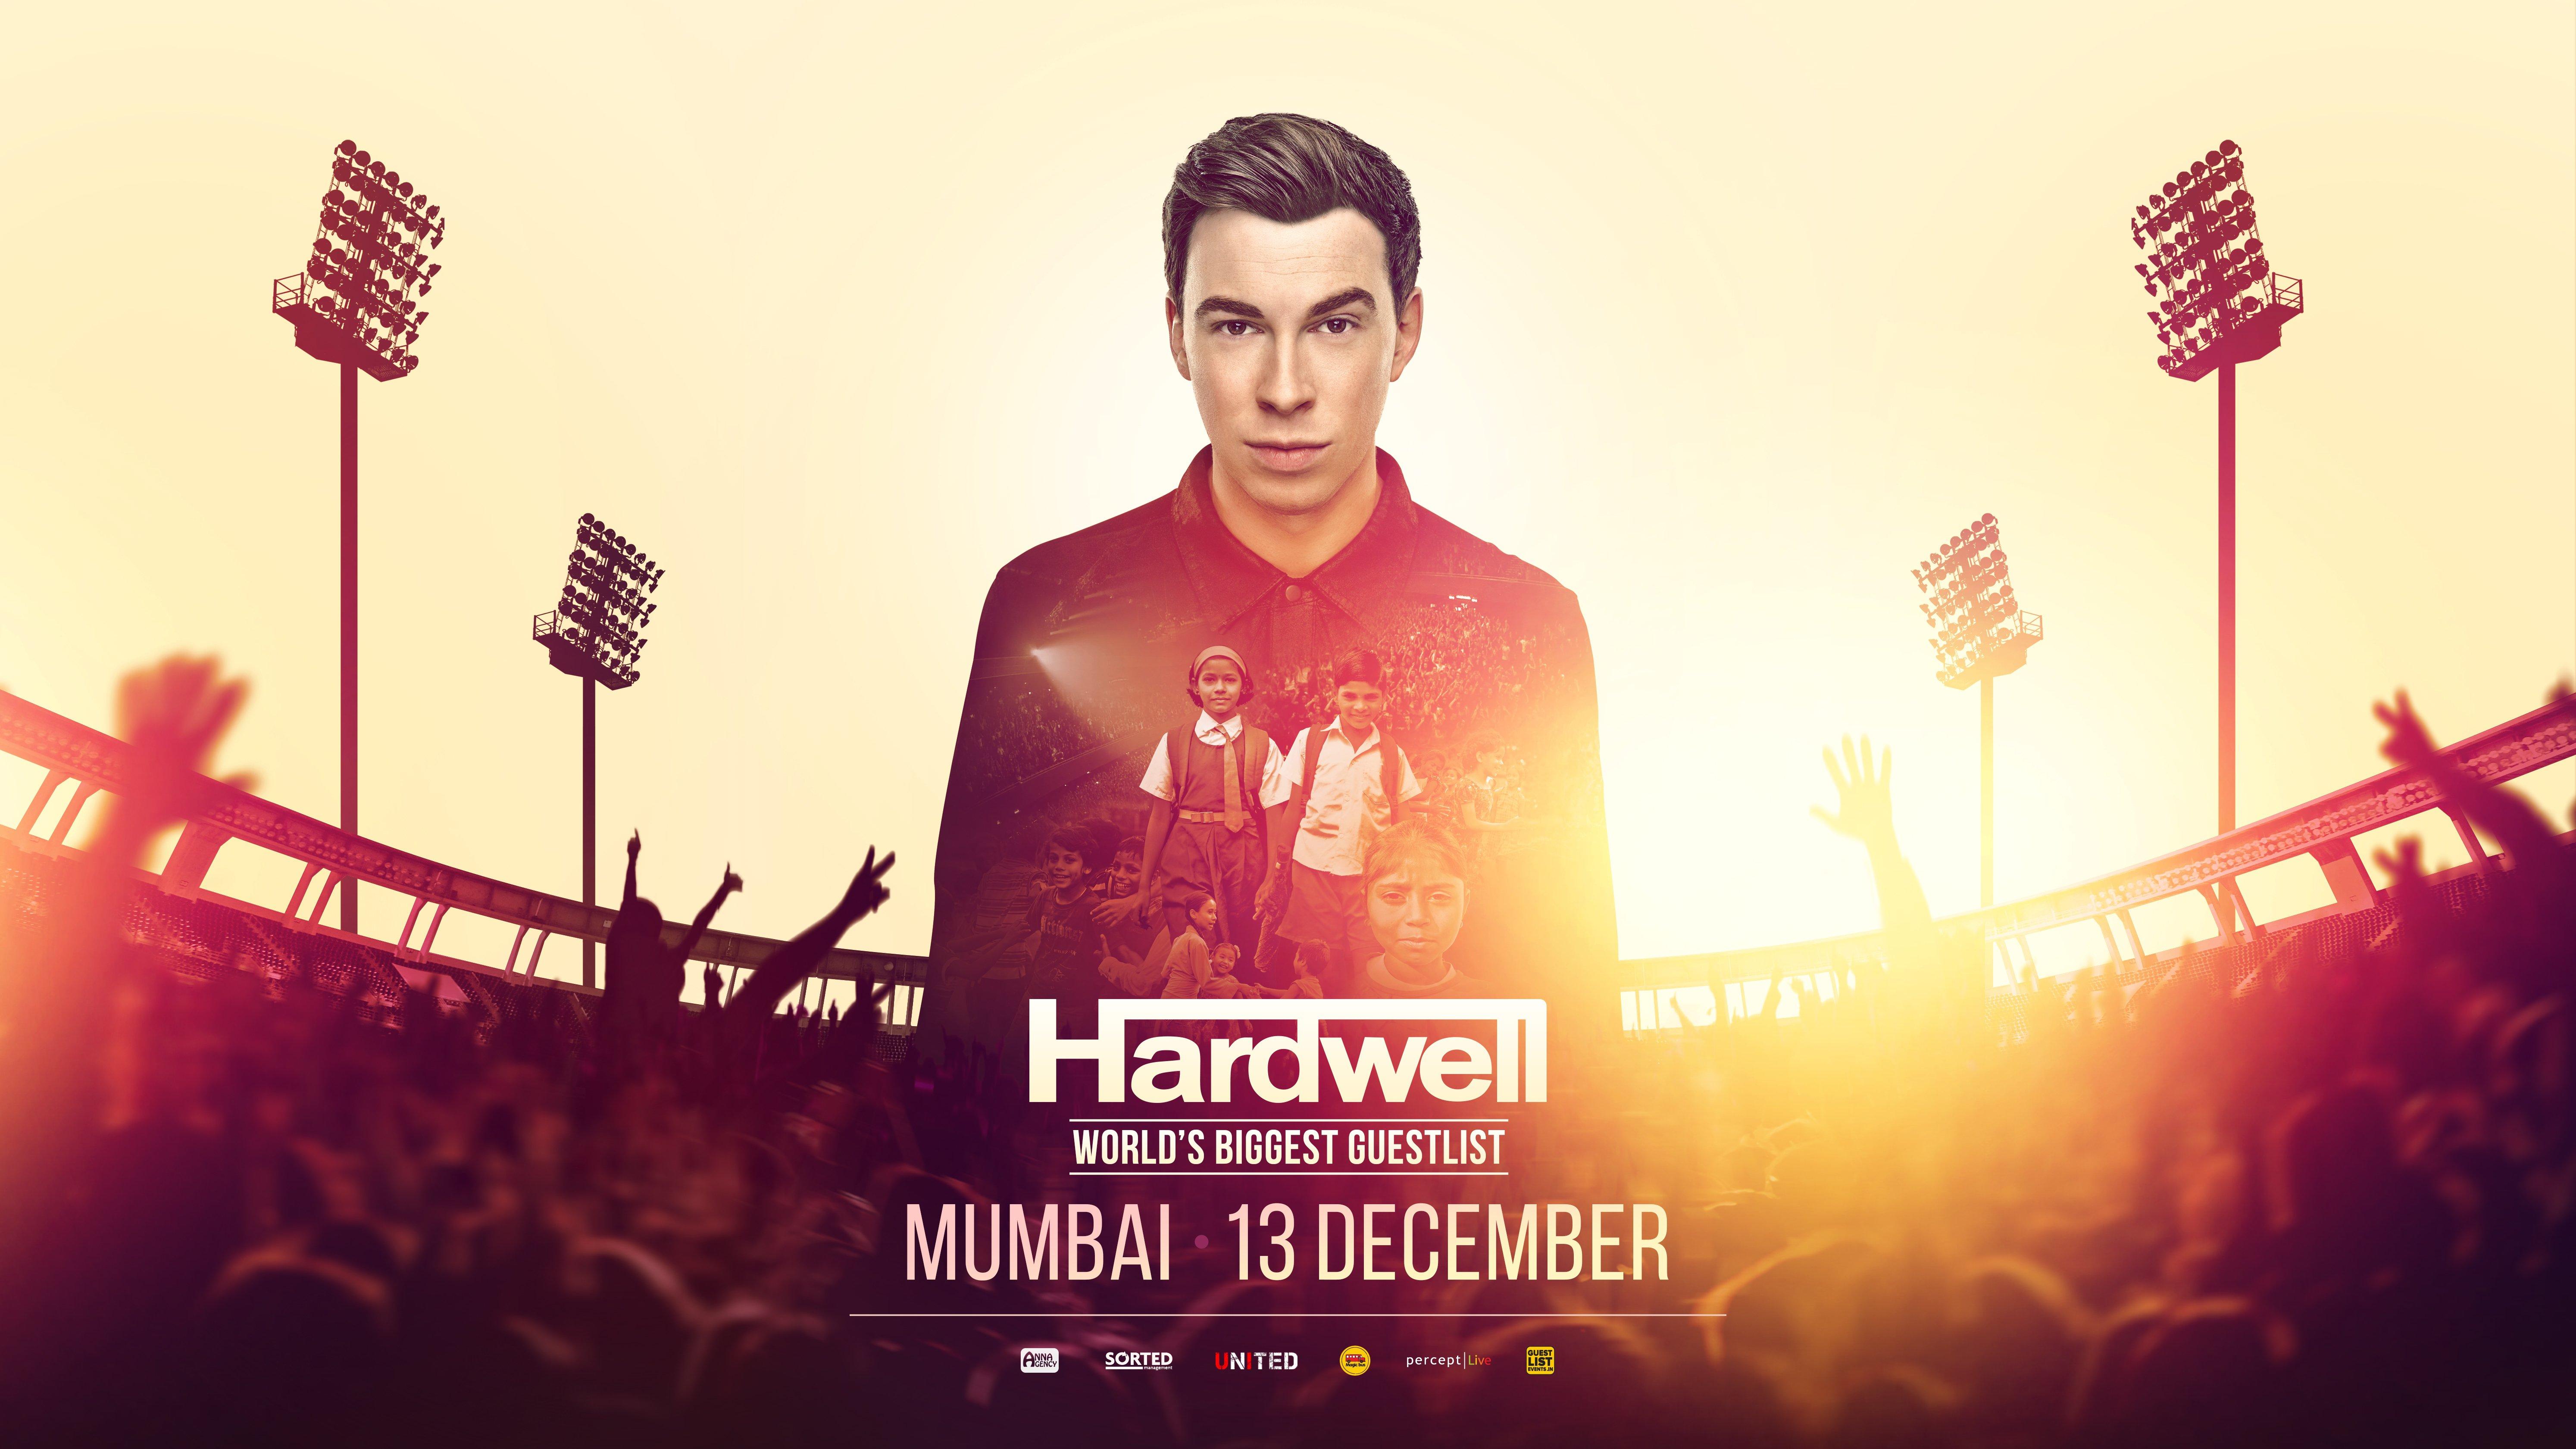 Hardwell I Am Hardwell Music Dj Poster Wallpapers Hd: United We Are Foundation 5k Retina Ultra HD